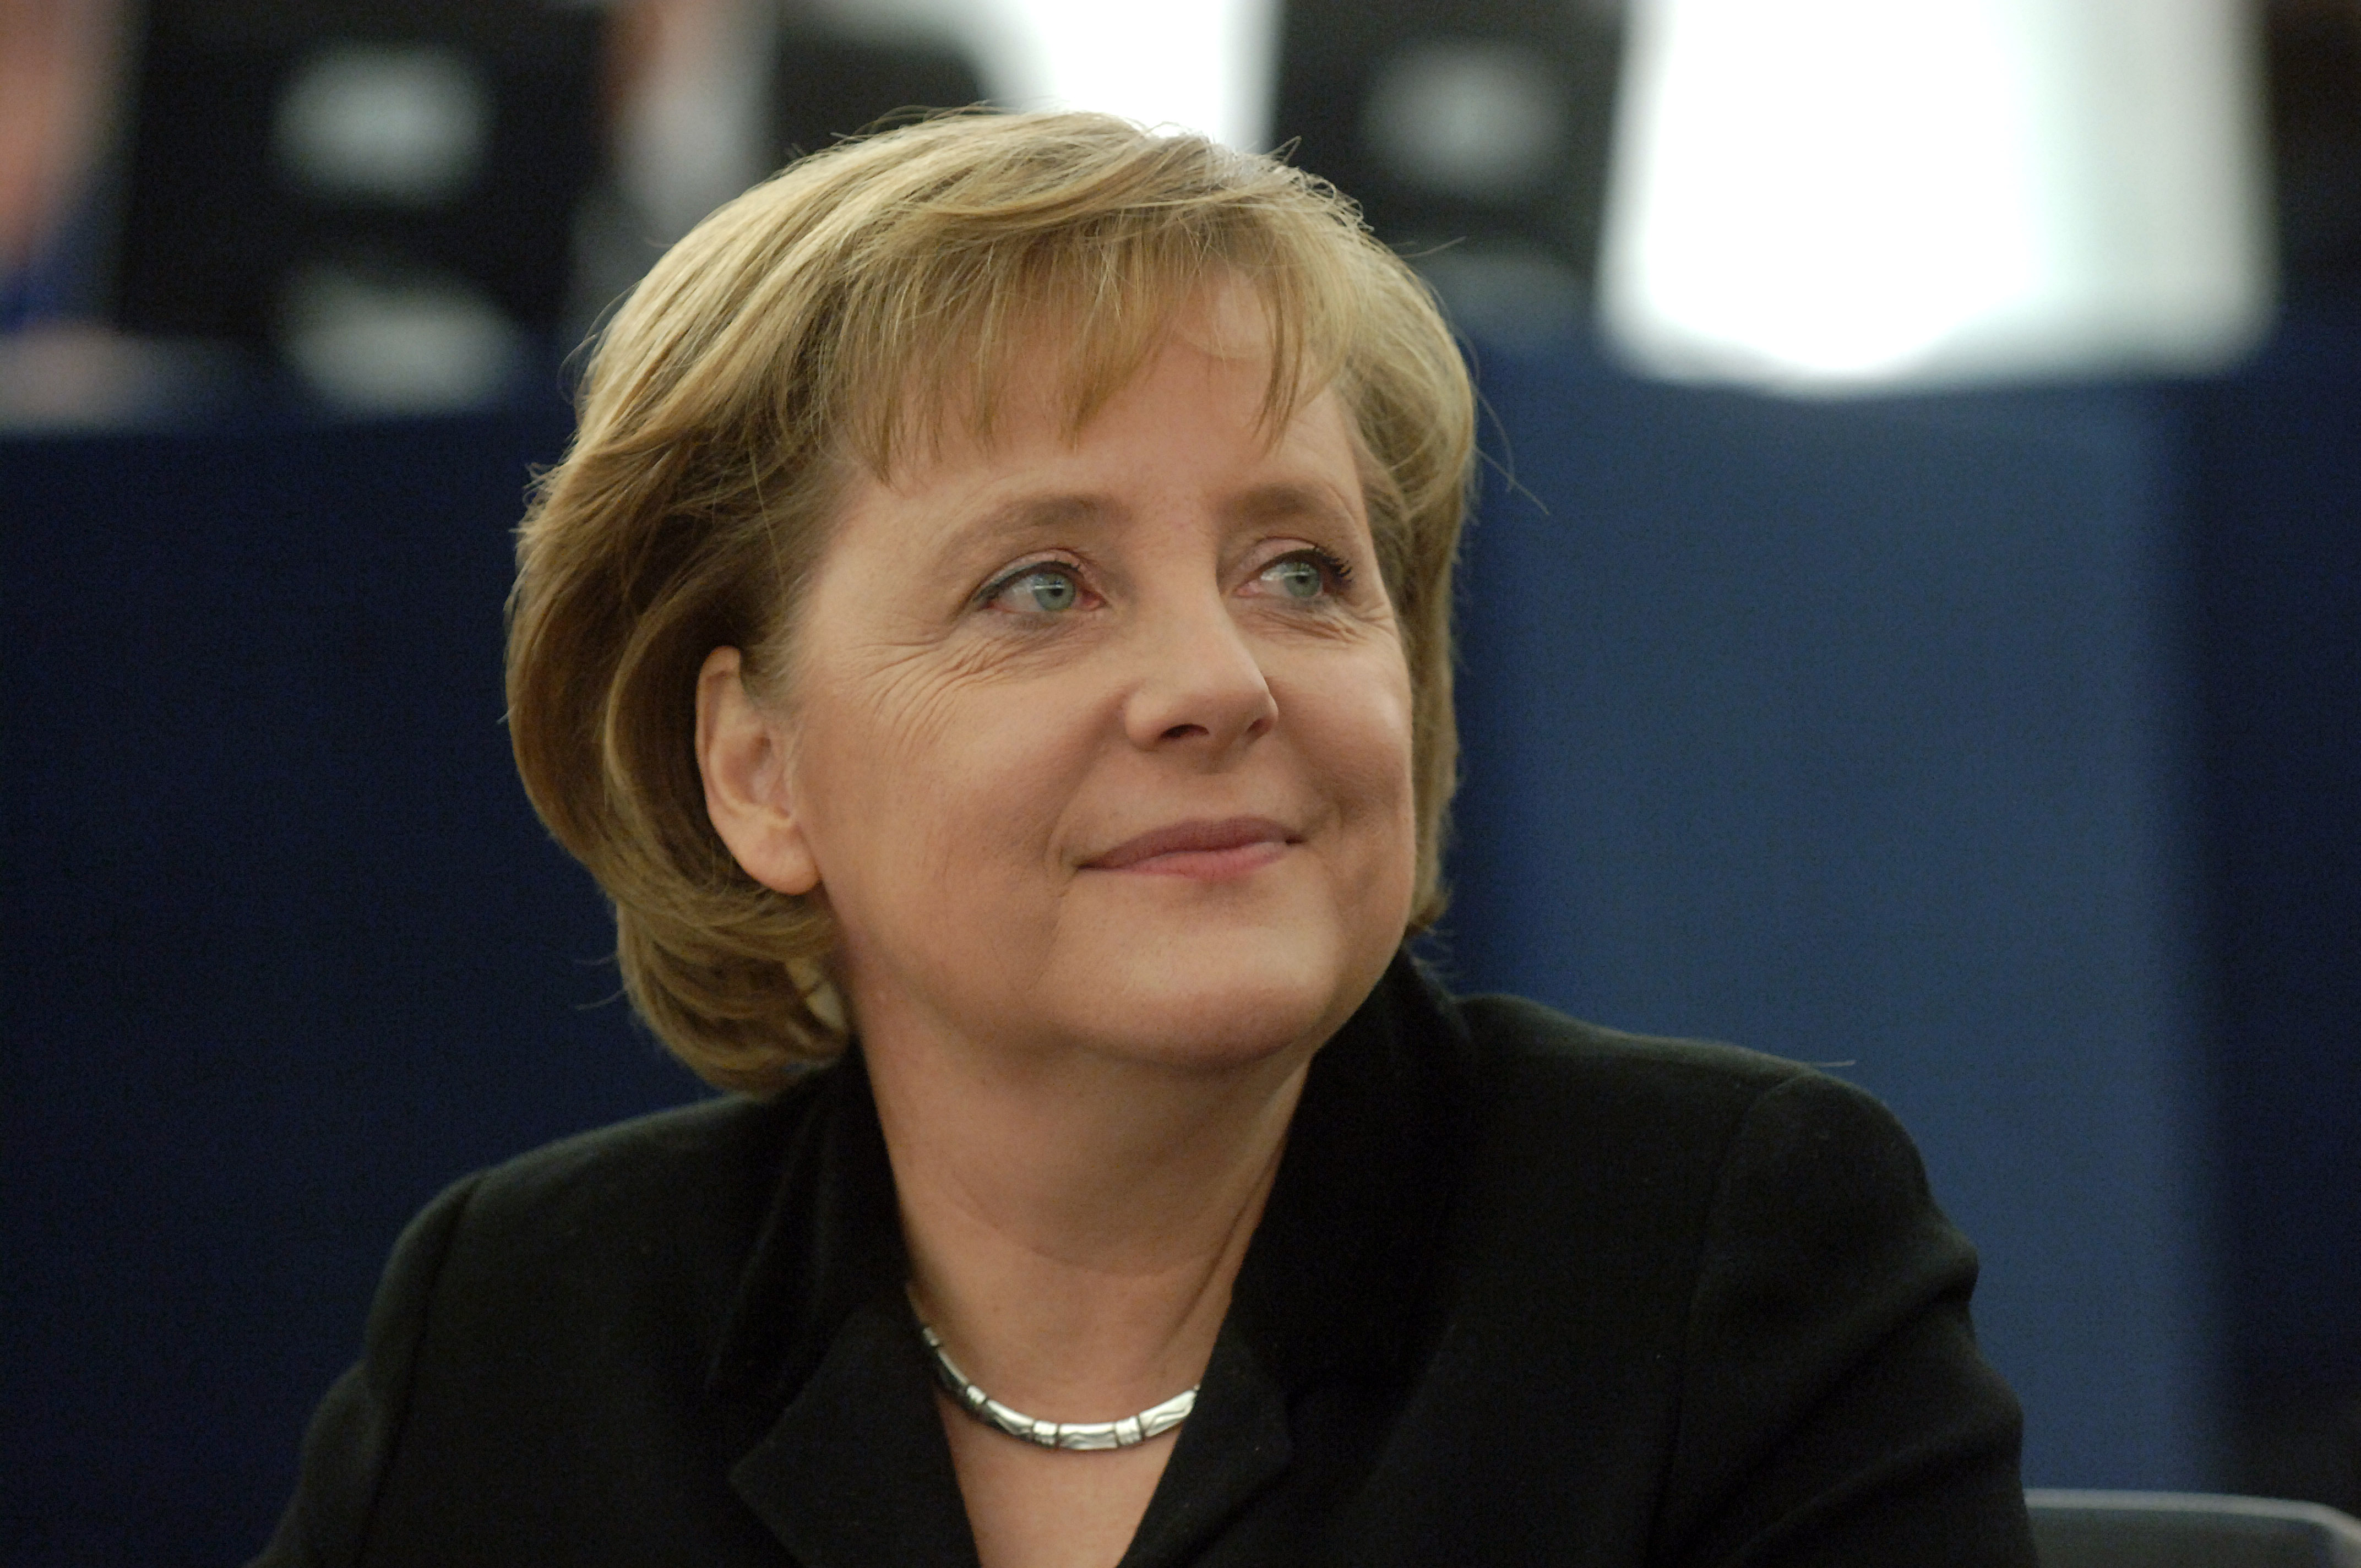 Angela Merkle